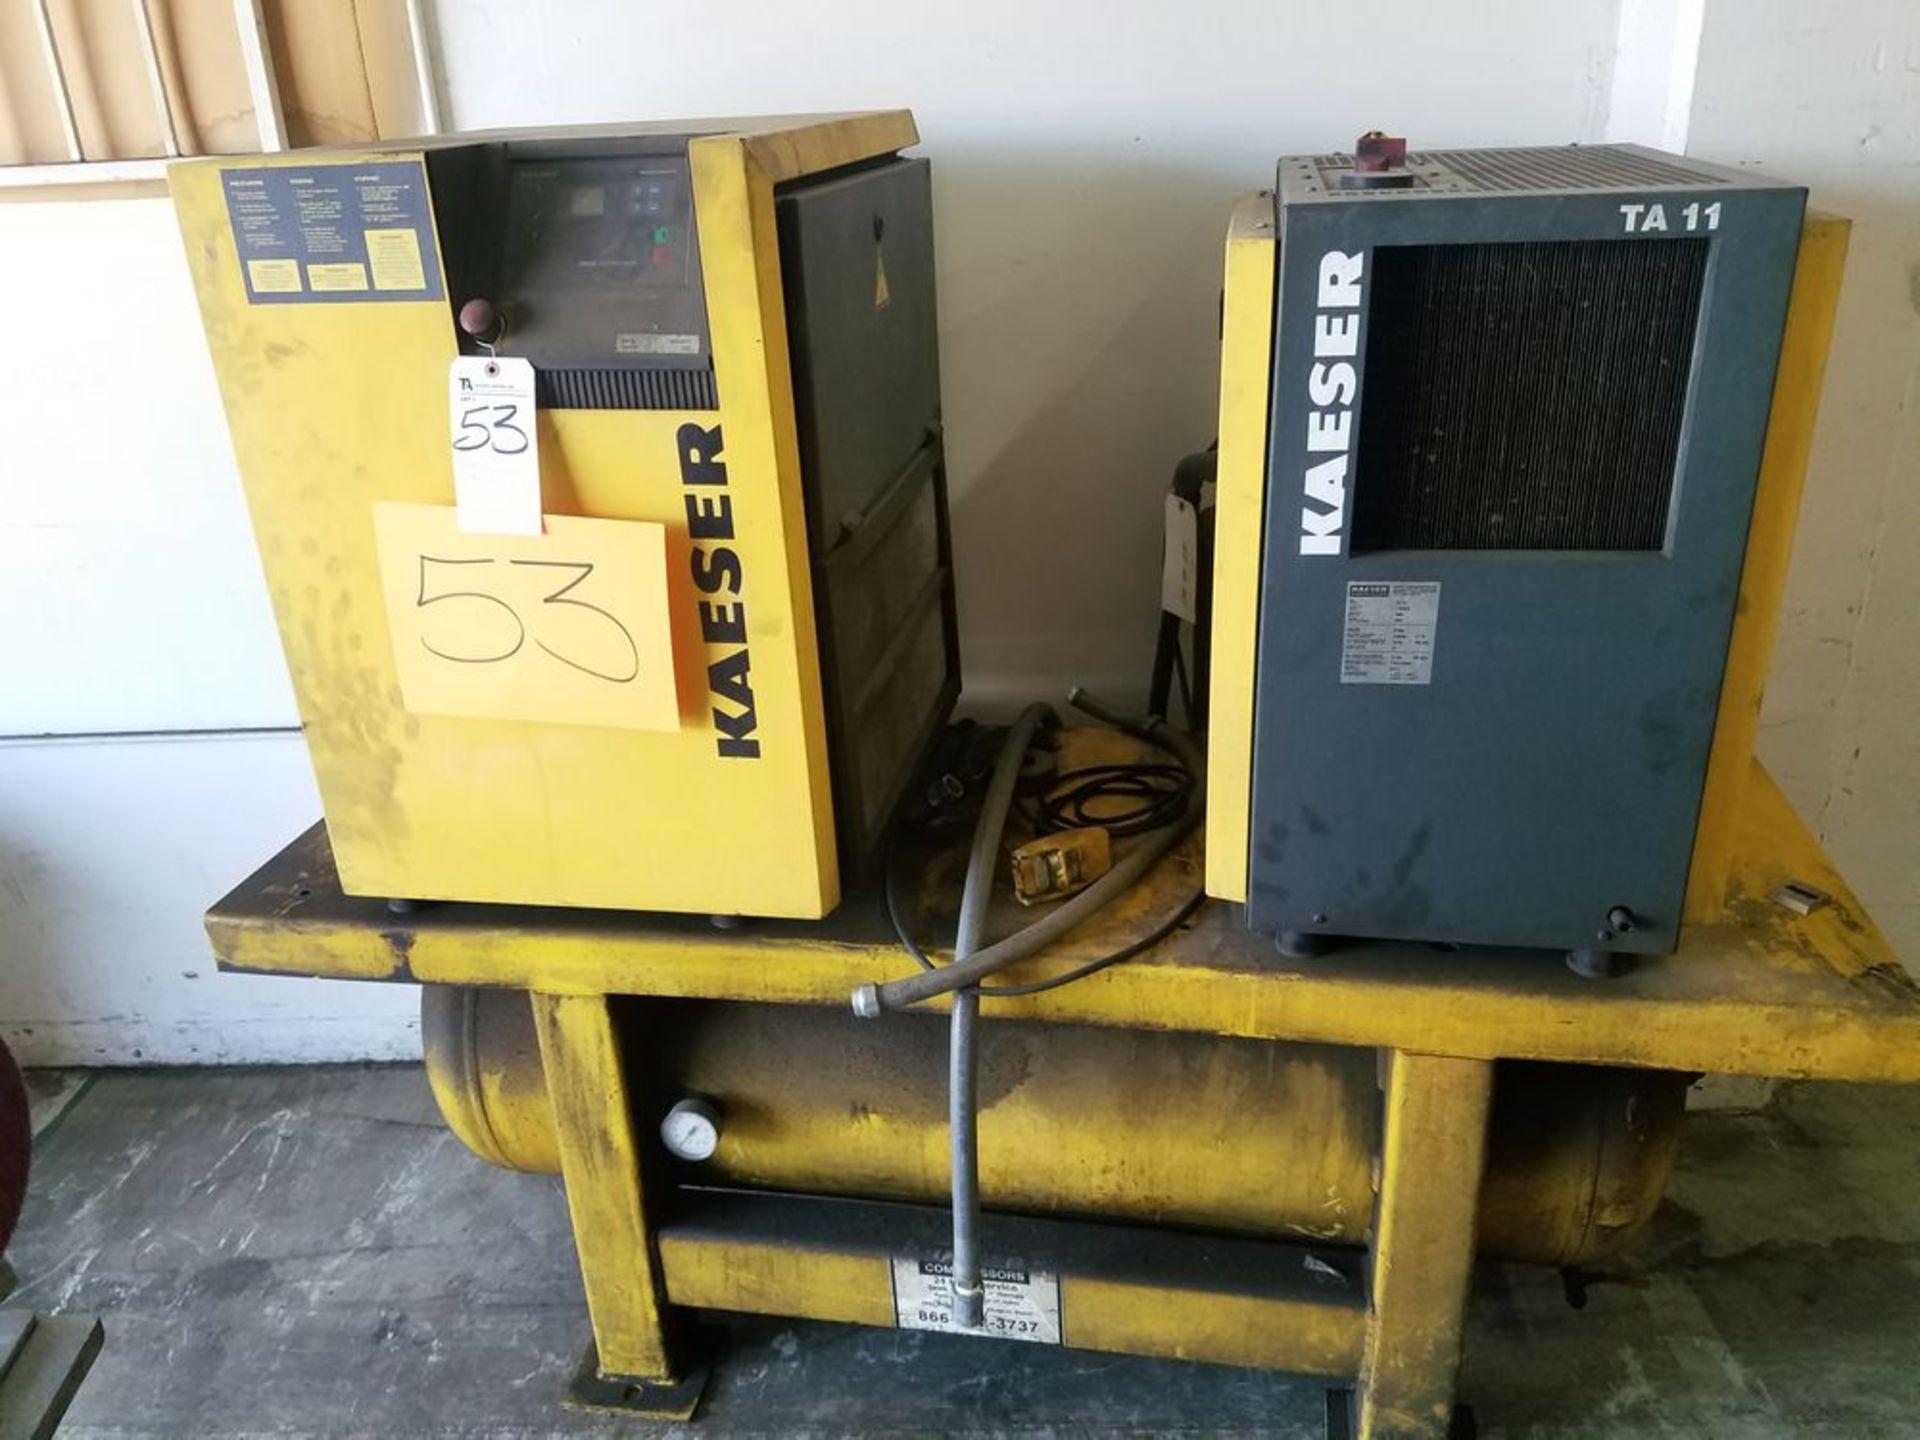 (2005) Kaeser mod. TA-11 and SMII, 10hp Rotary Screen Air Compressor